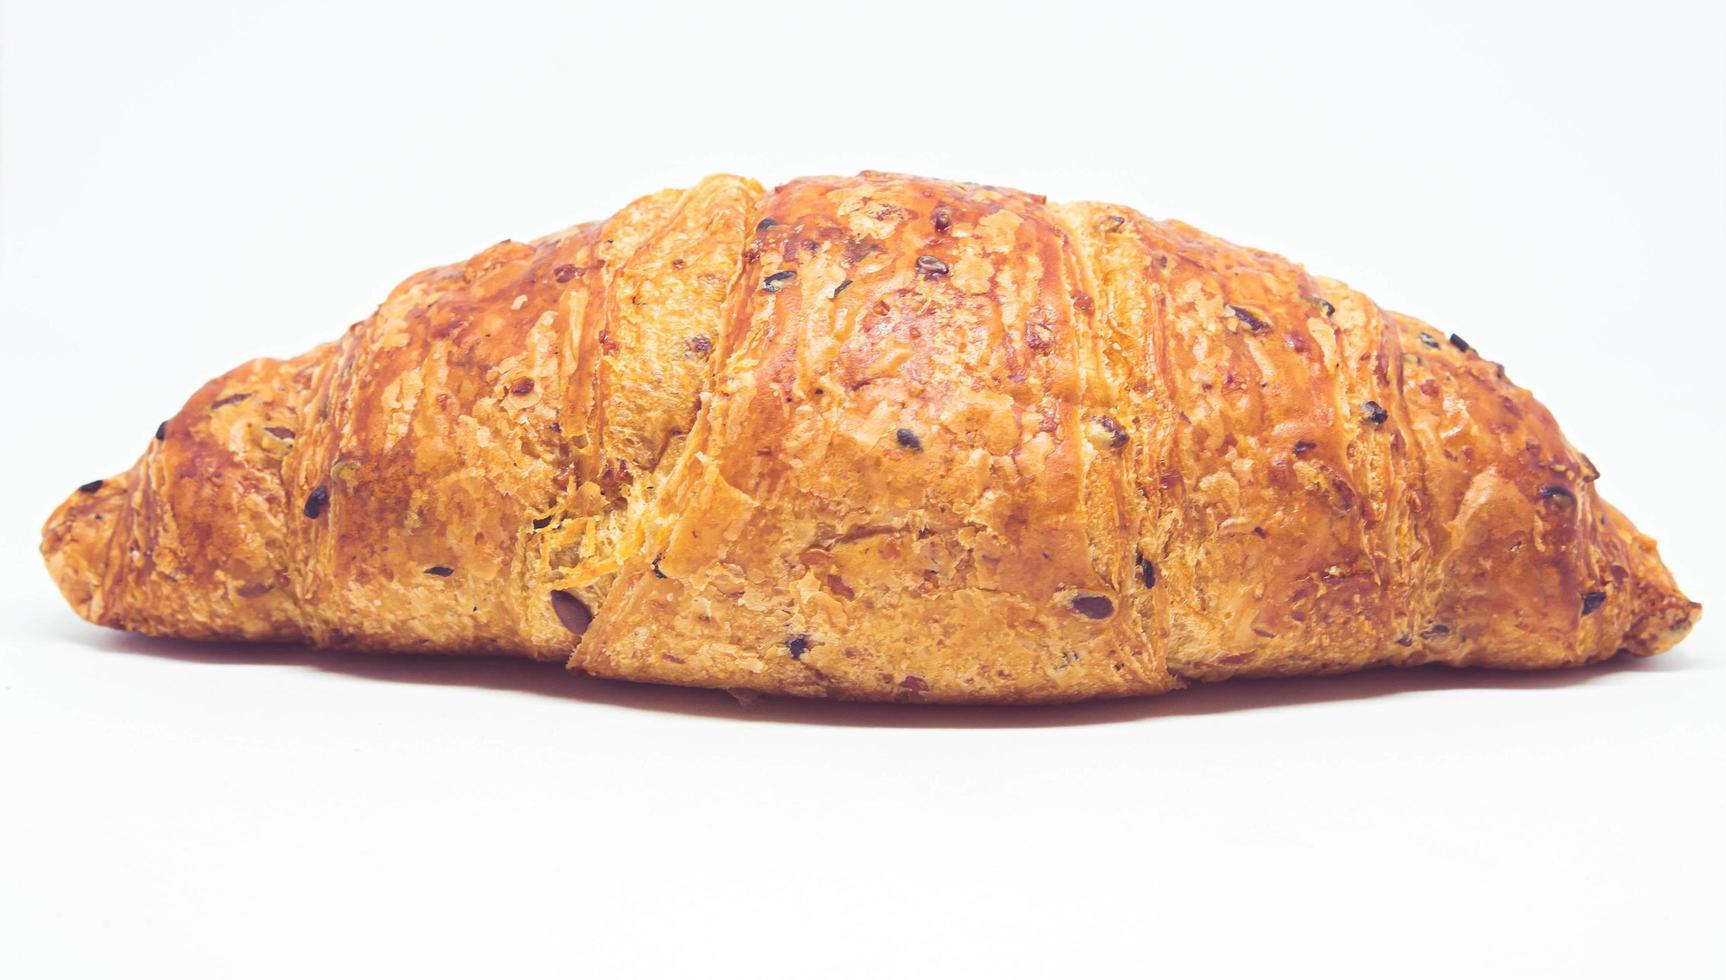 croissantbröd, france croissant isolerad på vit bakgrund foto